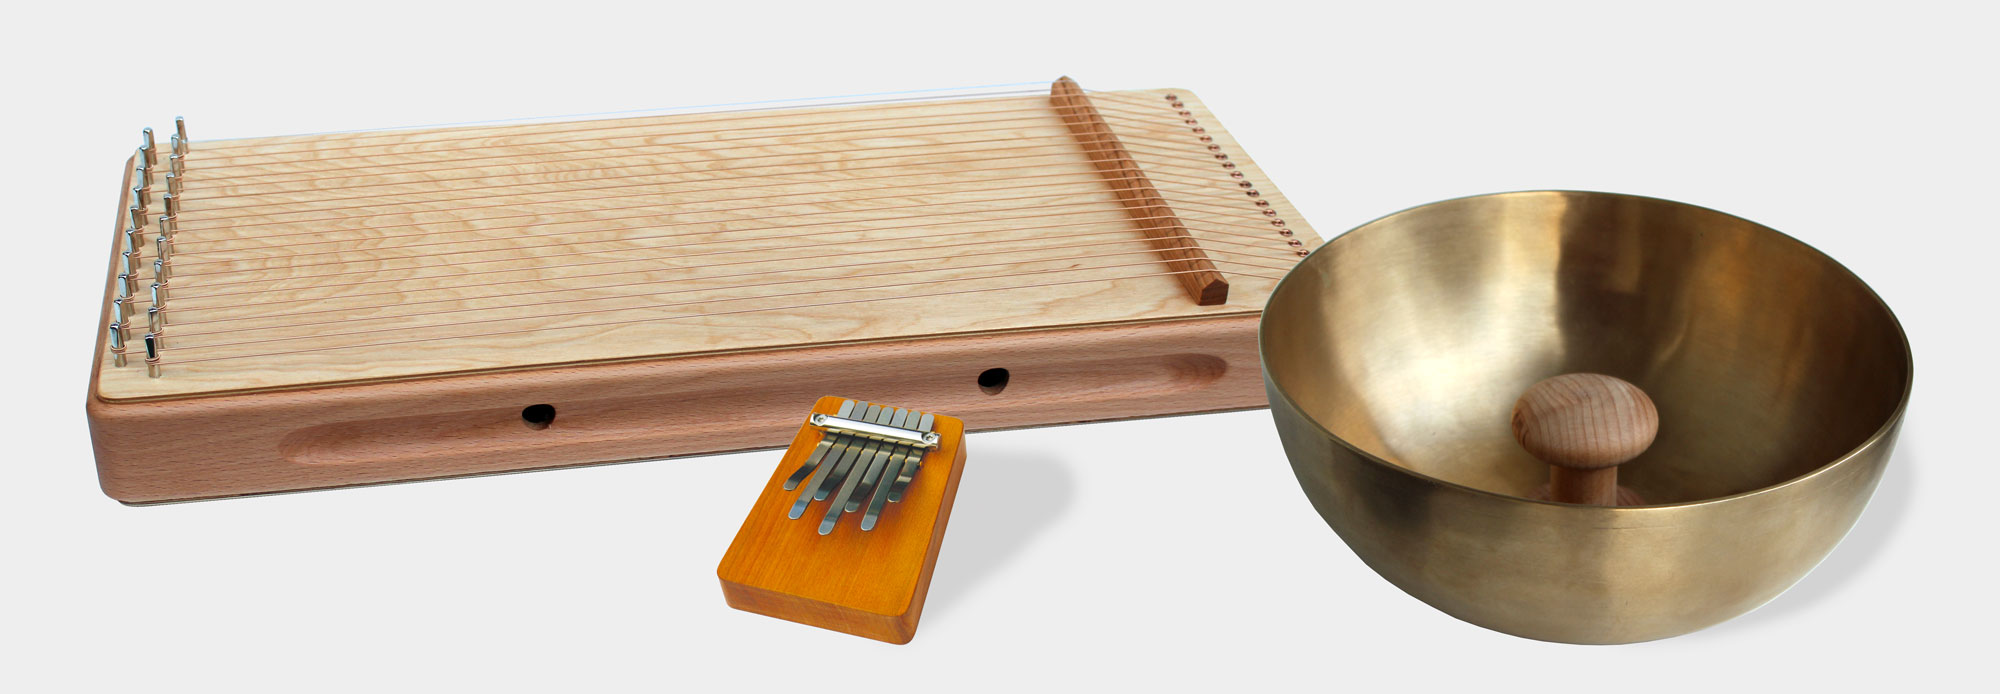 Klanginstrumente